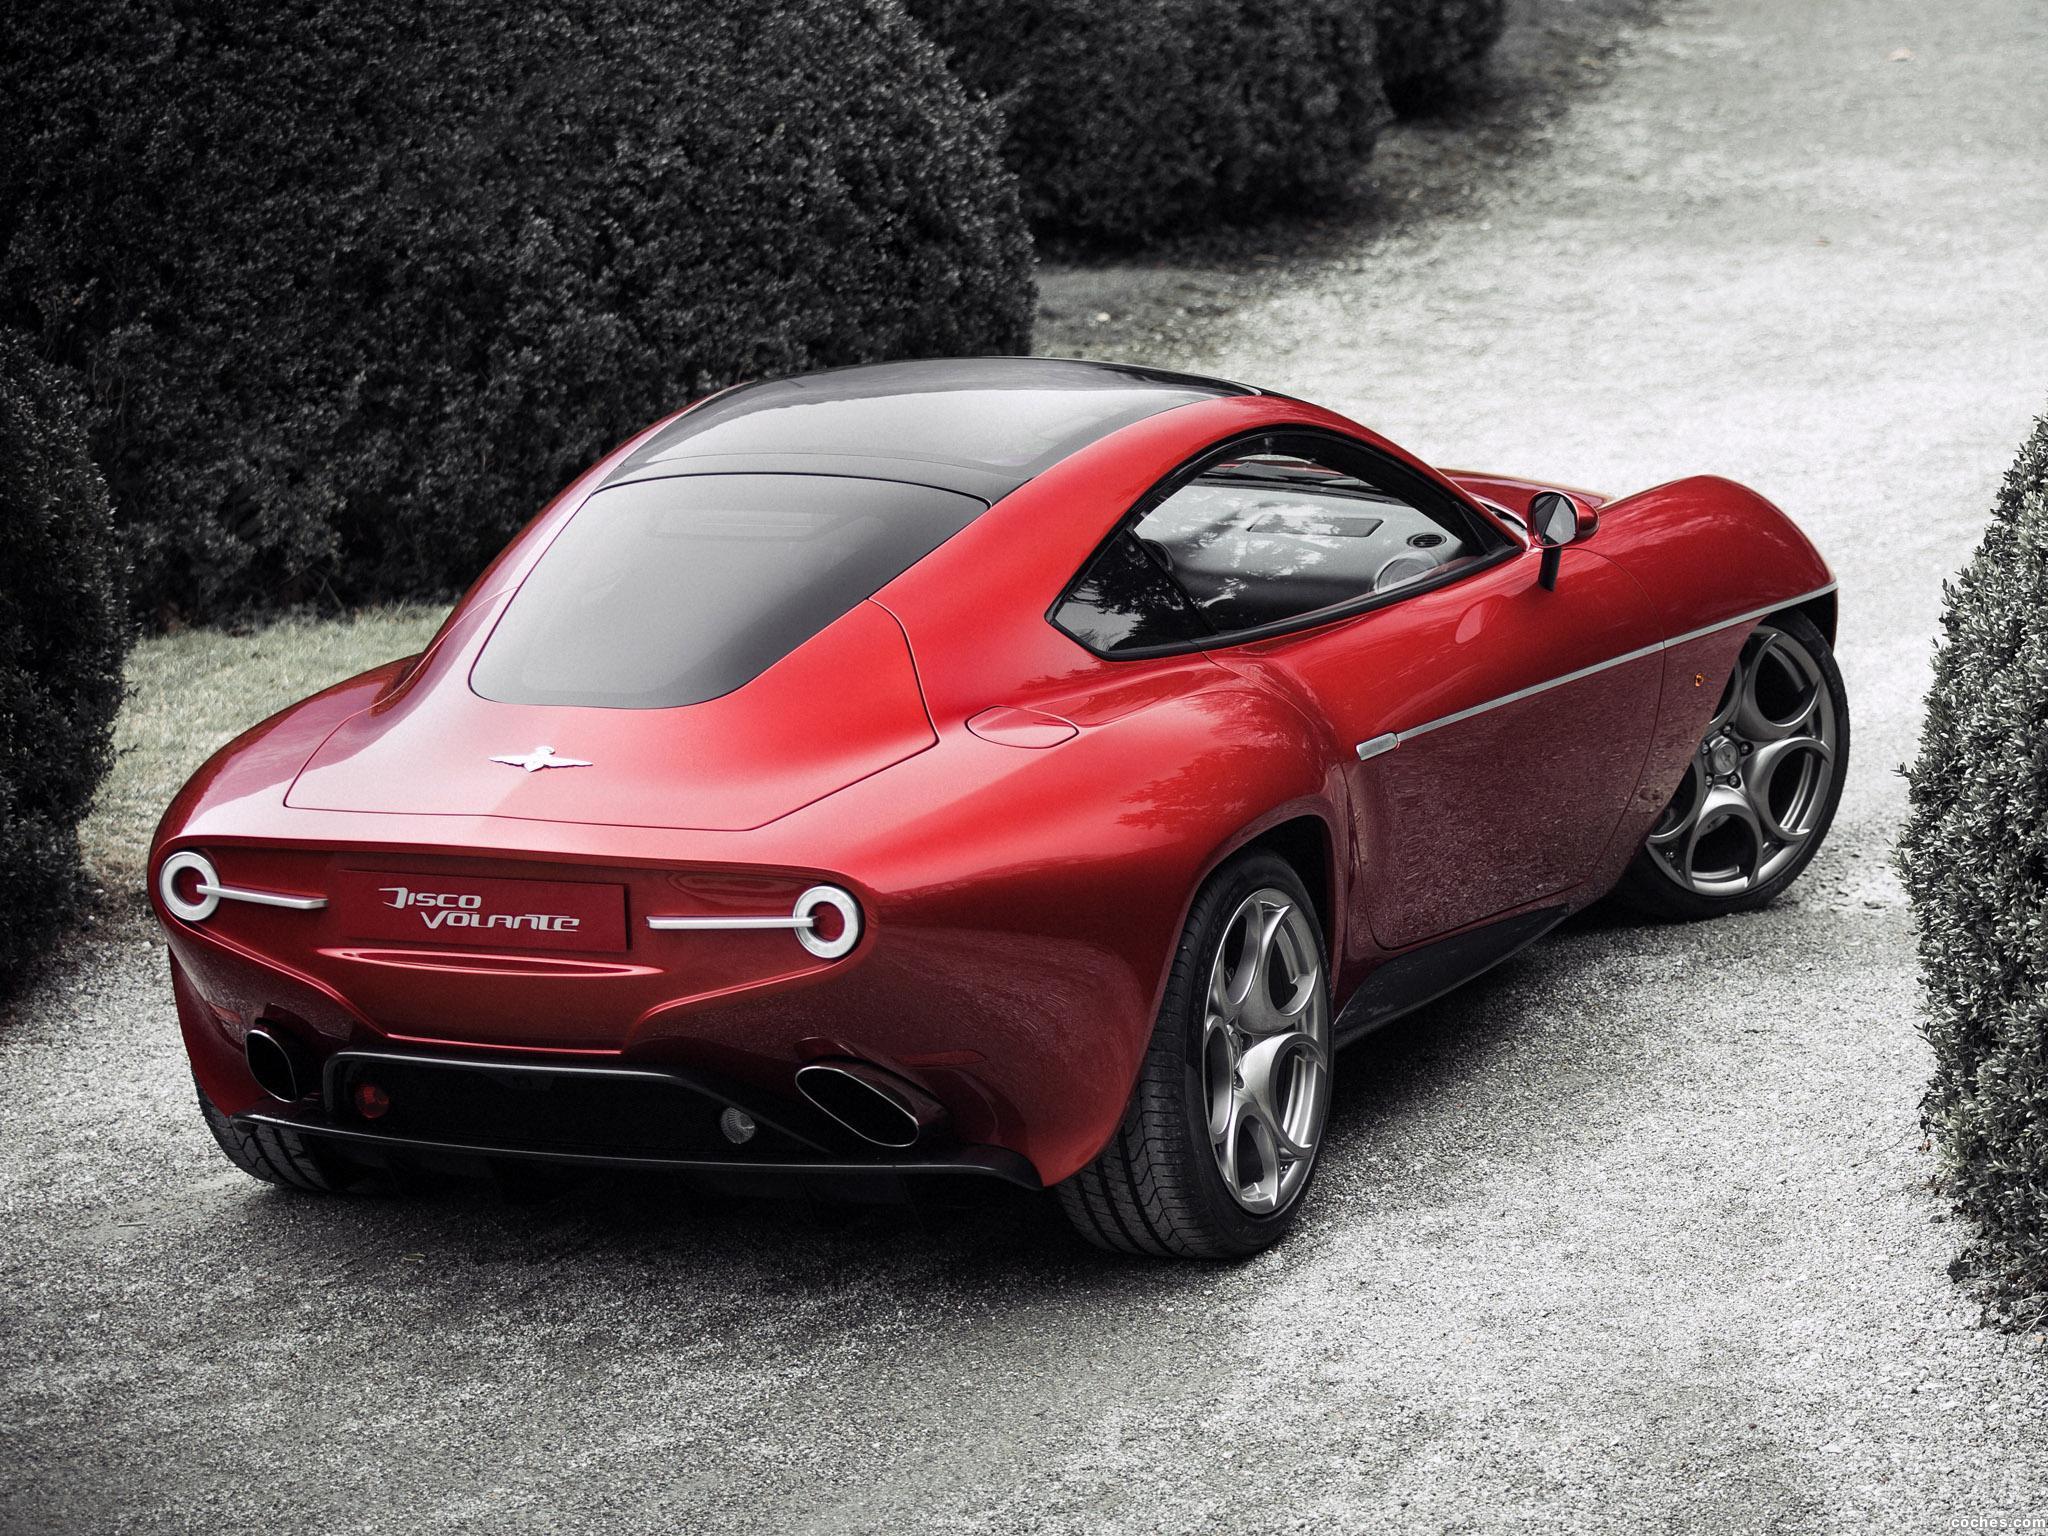 Fotos De Alfa Romeo Disco Volante 2013 Foto 6